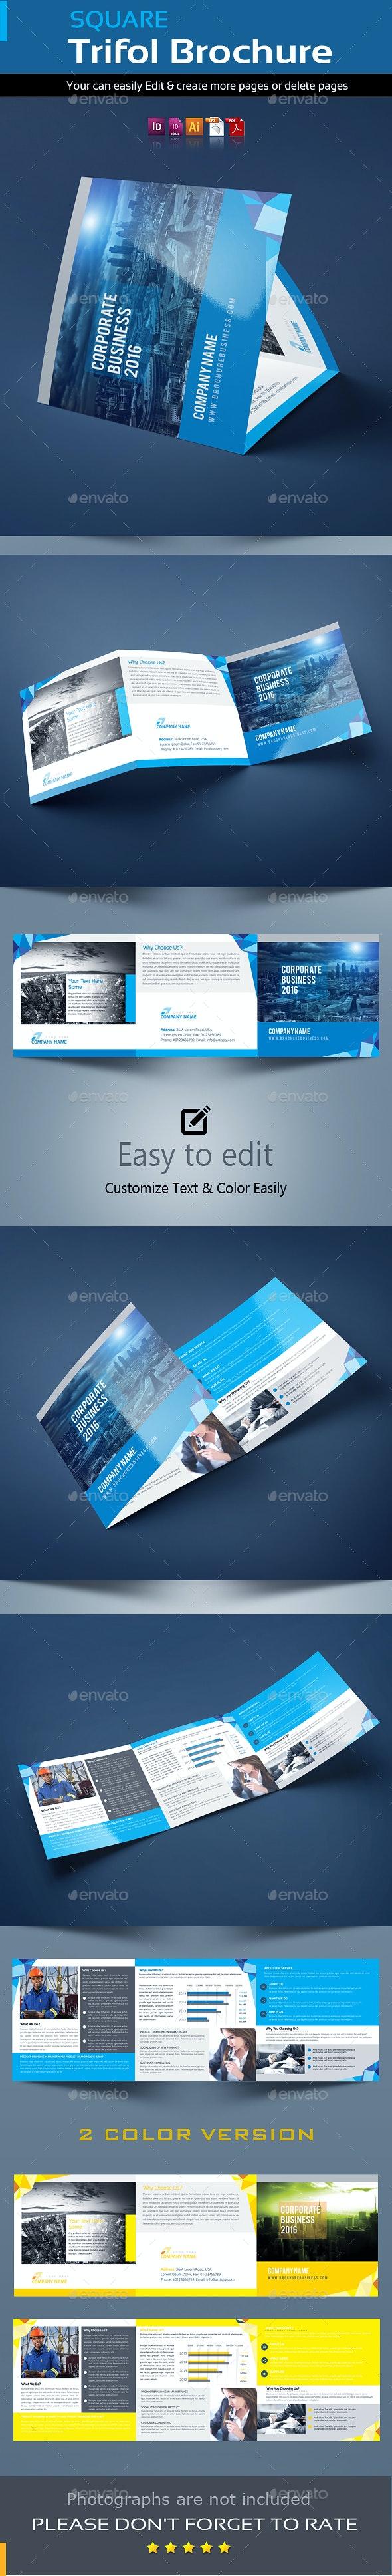 Squire Tri-Fold Brochure Template - Brochures Print Templates